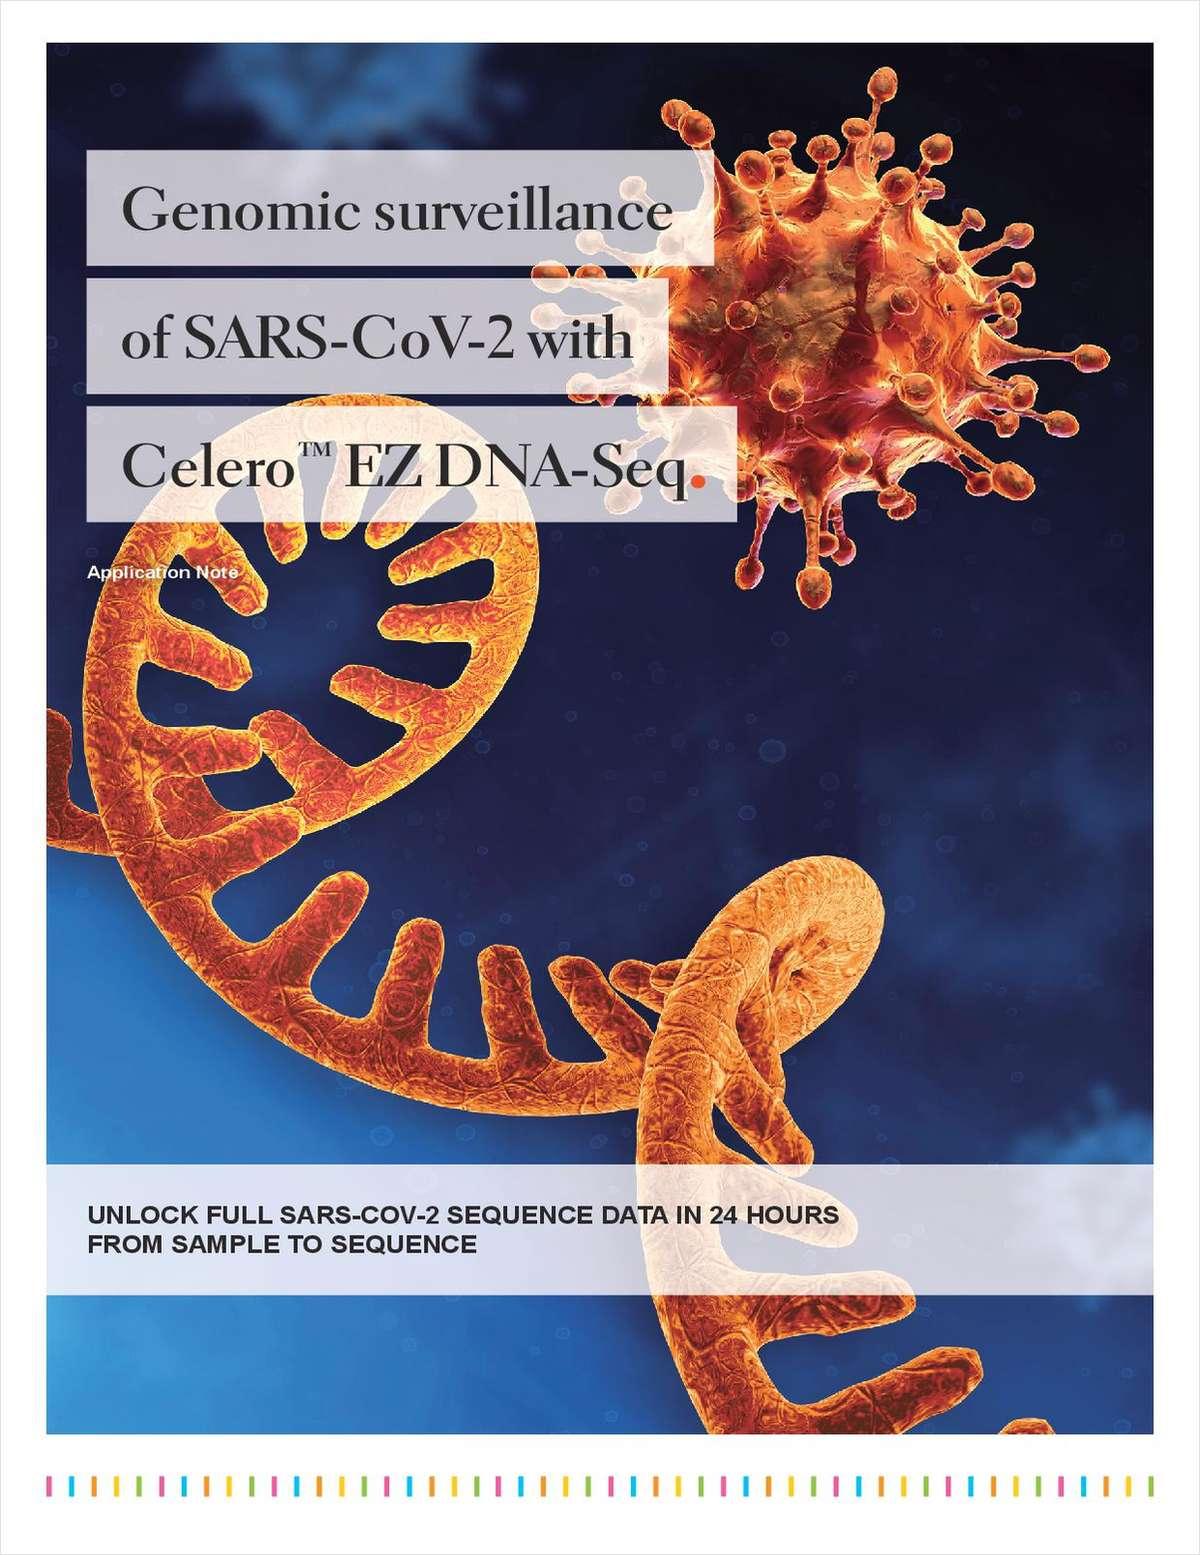 Genomic Surveillance of SARS-CoV-2 with Celero EZ DNA-Seq